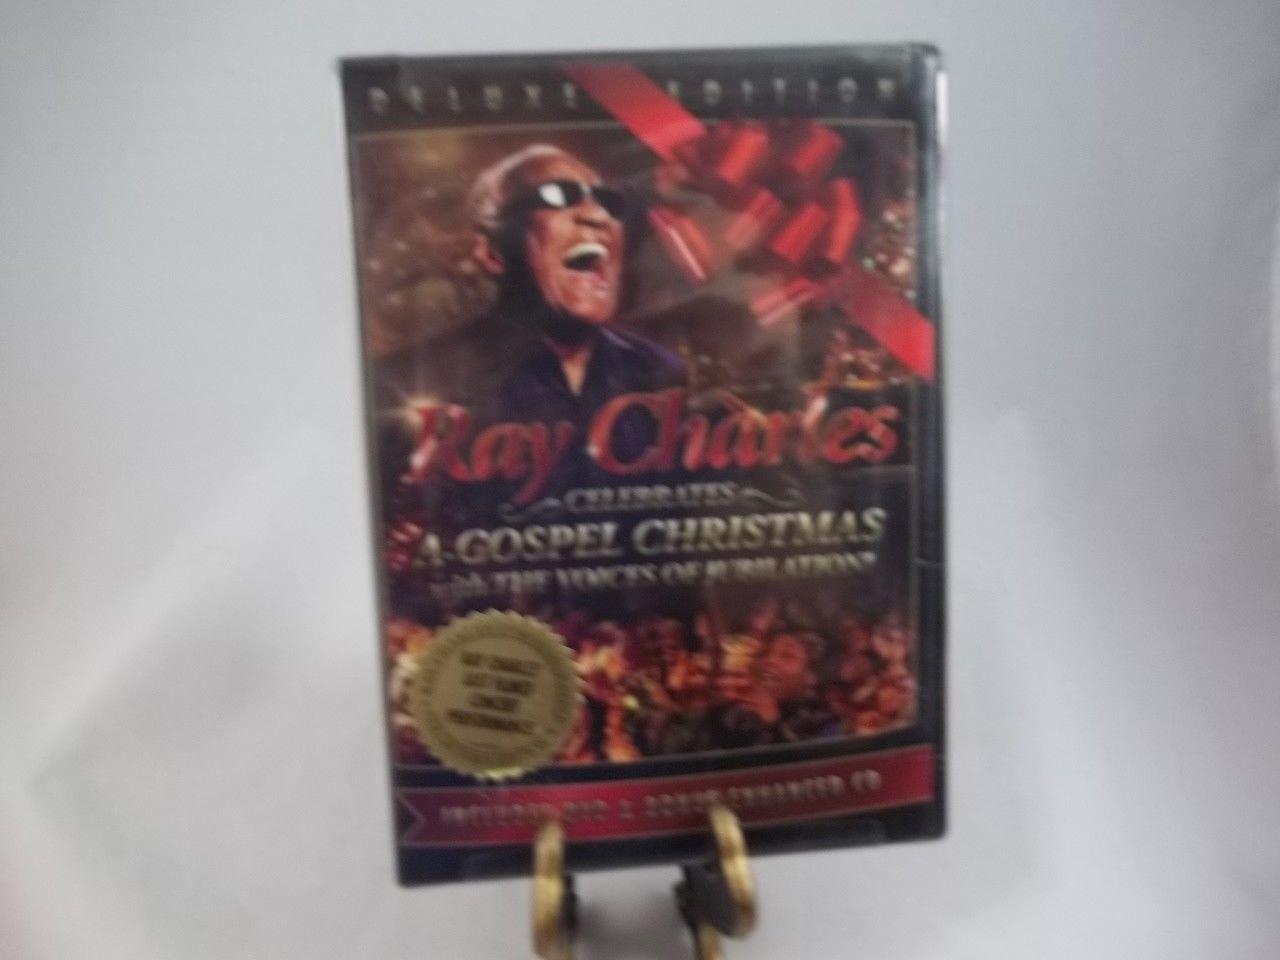 Ray Charles Christmas.Ray Charles Gospel Christmas With The And Similar Items